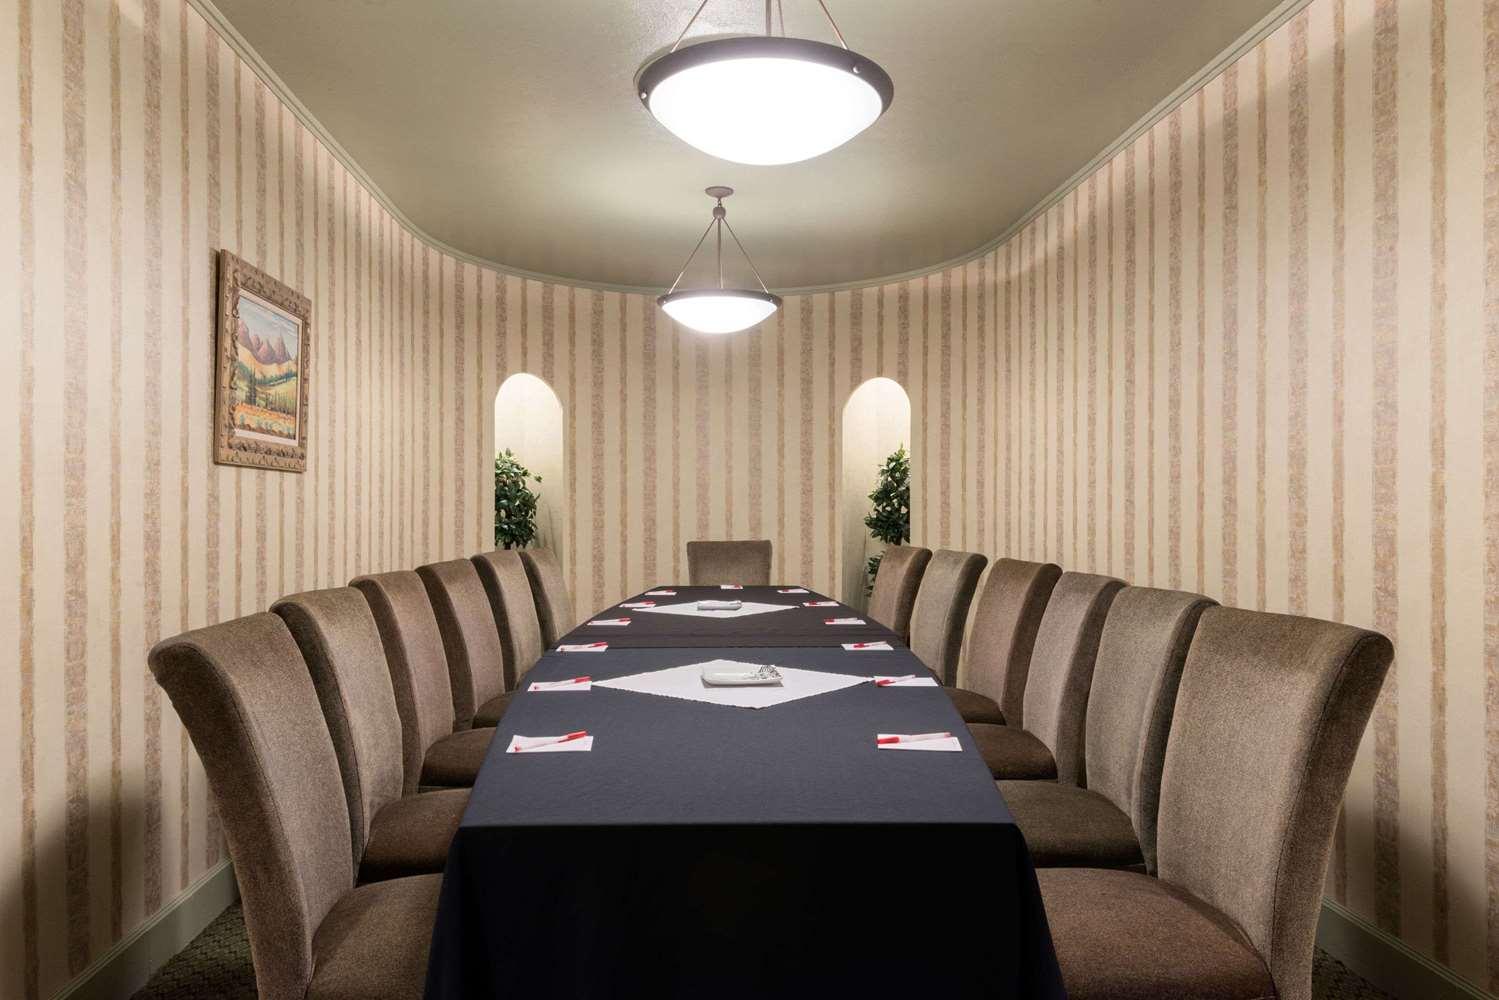 Meeting Facilities - Ramada Inn Convention Center Downtown Topeka